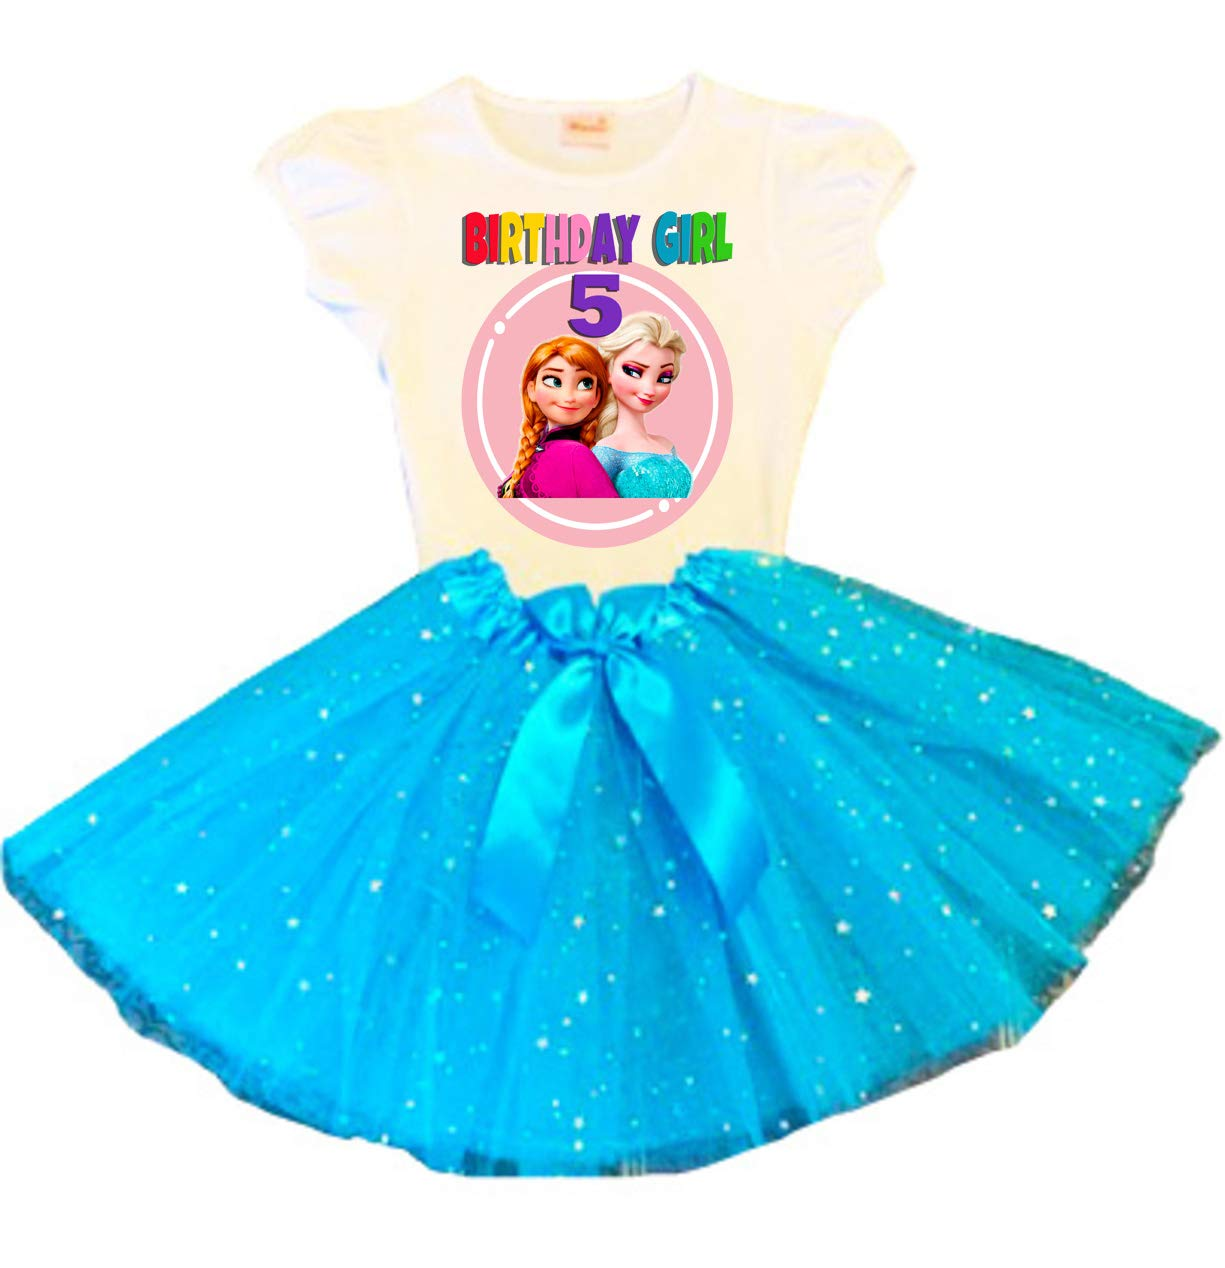 Frozen Elsa Anna 4 years warranty Birthday Tutu 5th Party Dress Ranking TOP17 Turquo